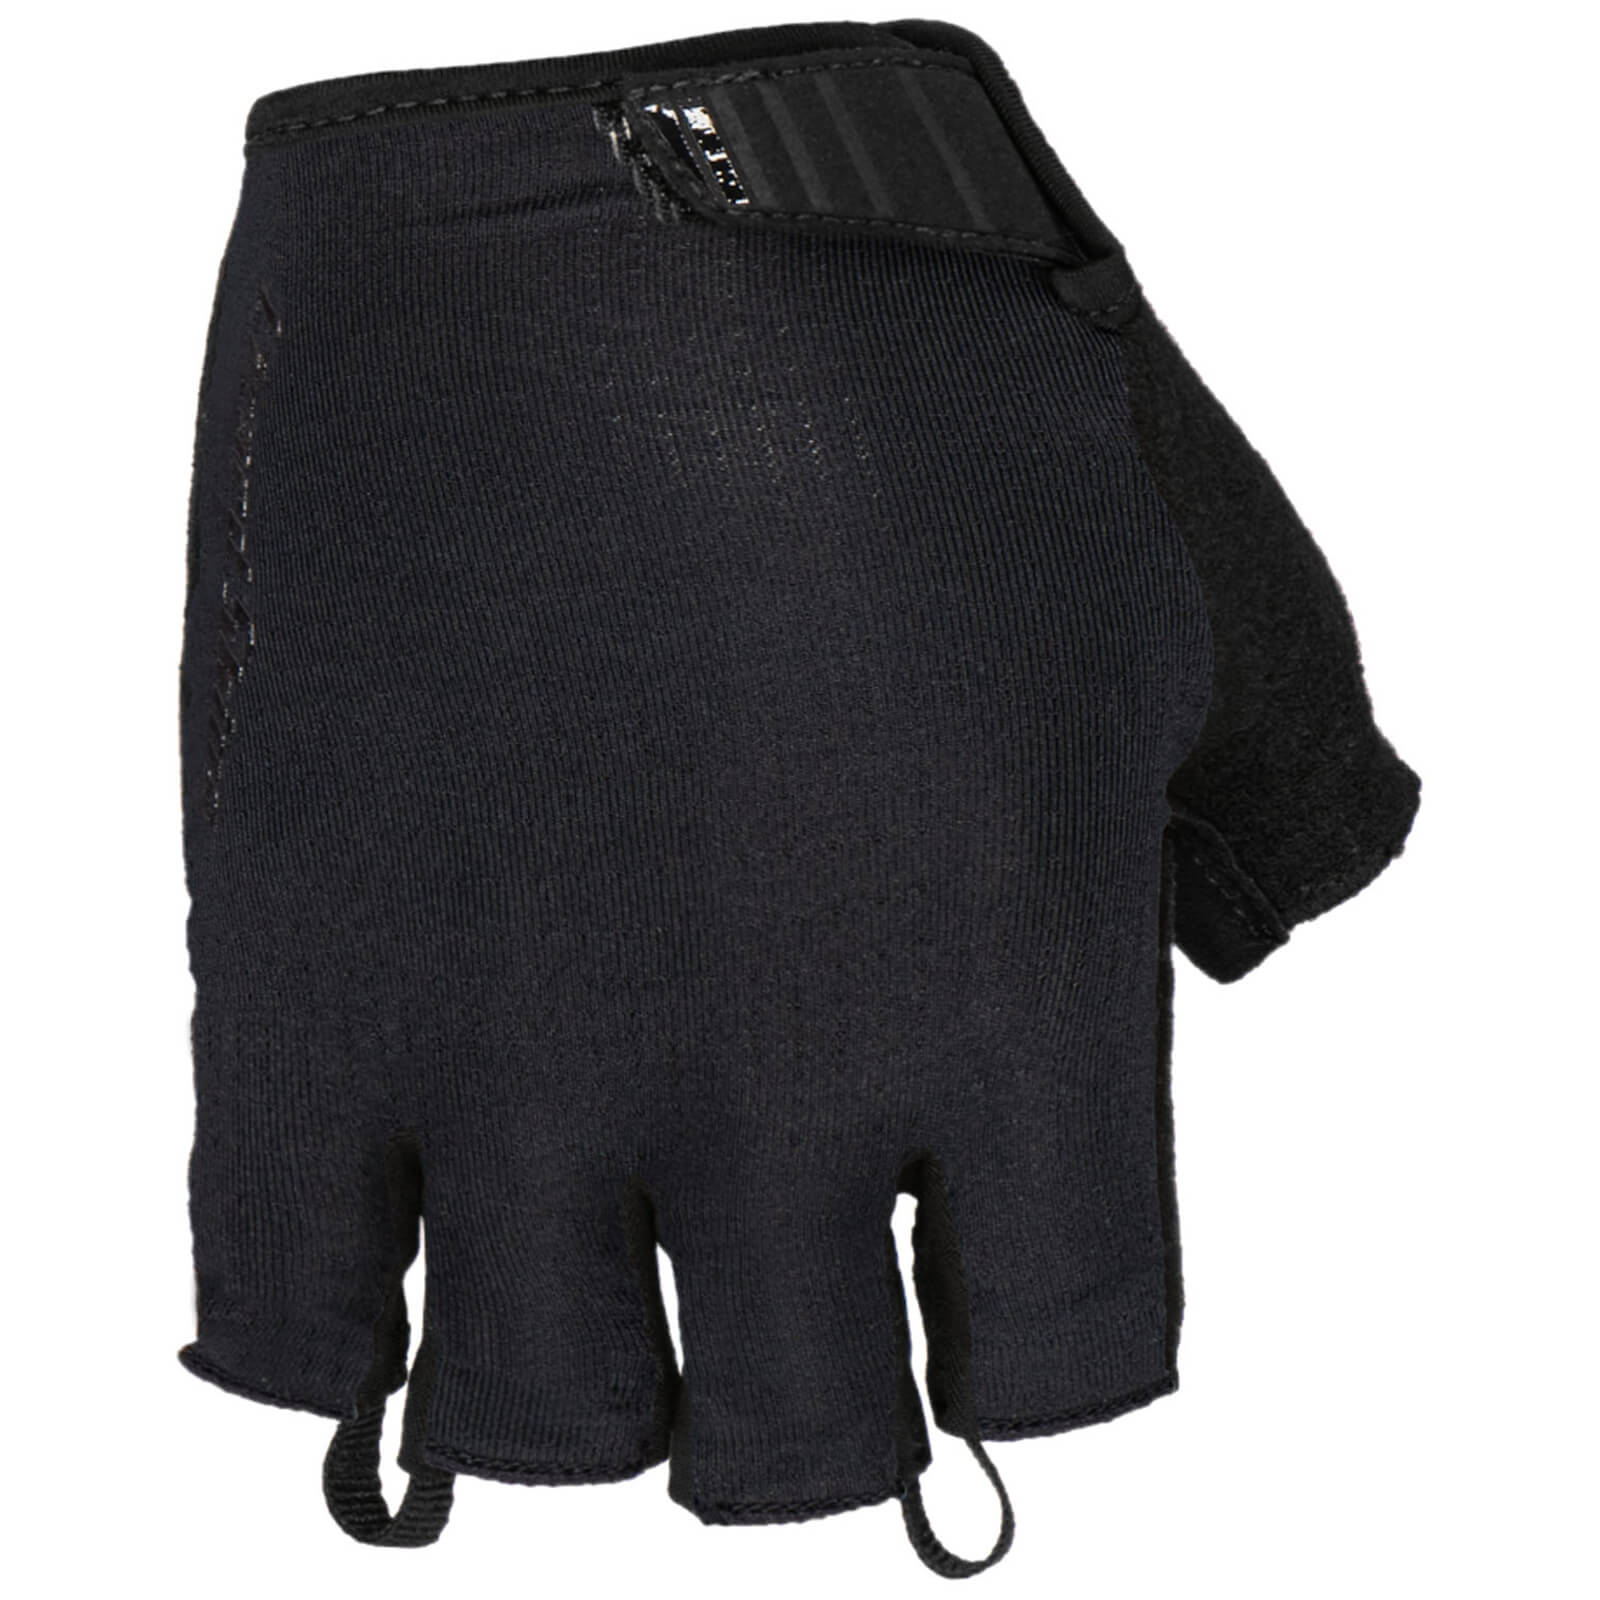 Lizard Skins Aramus Apex Gloves - M - Jet Black